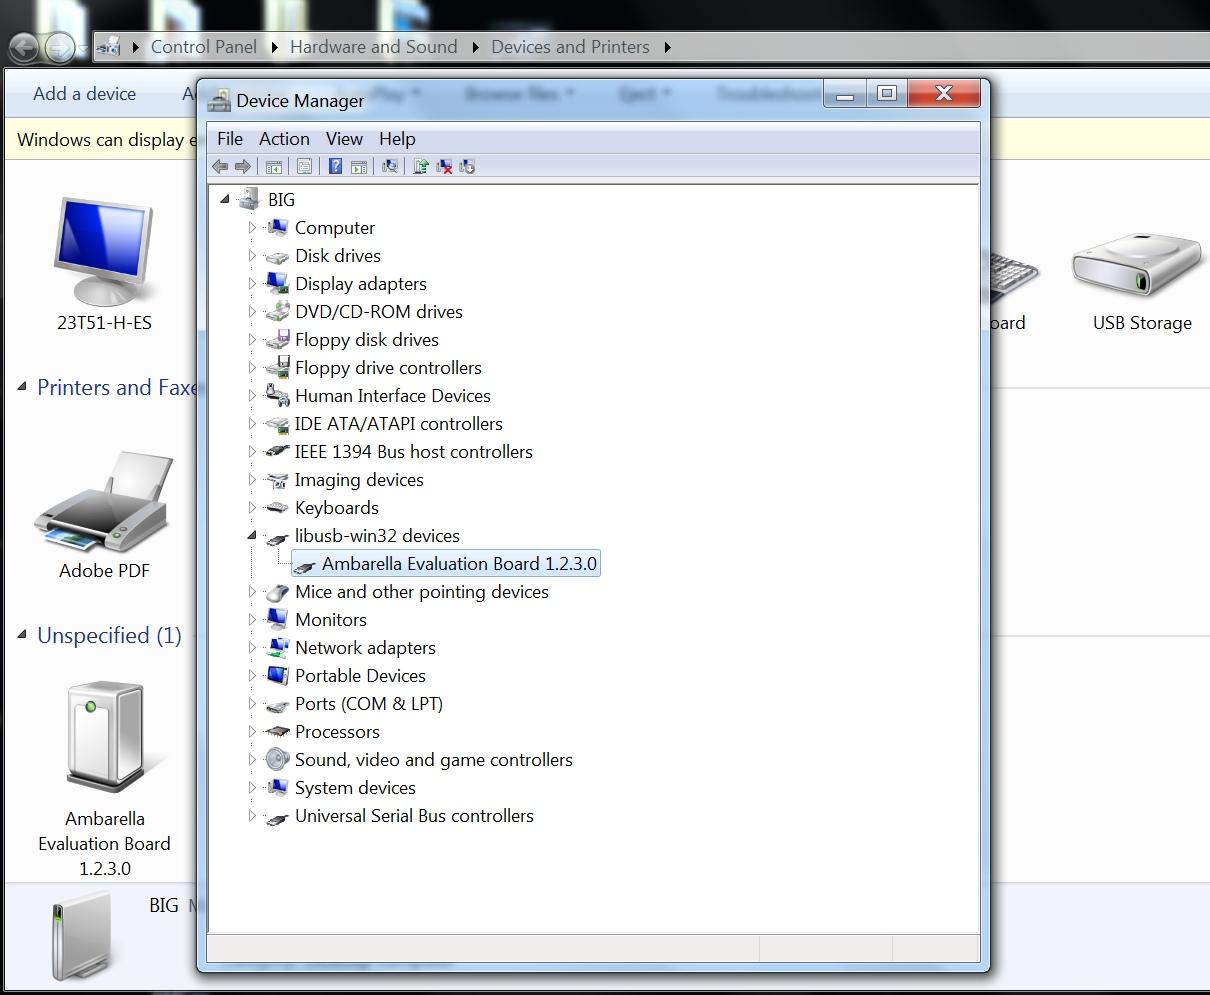 SJCam SJ5000+ driver installed